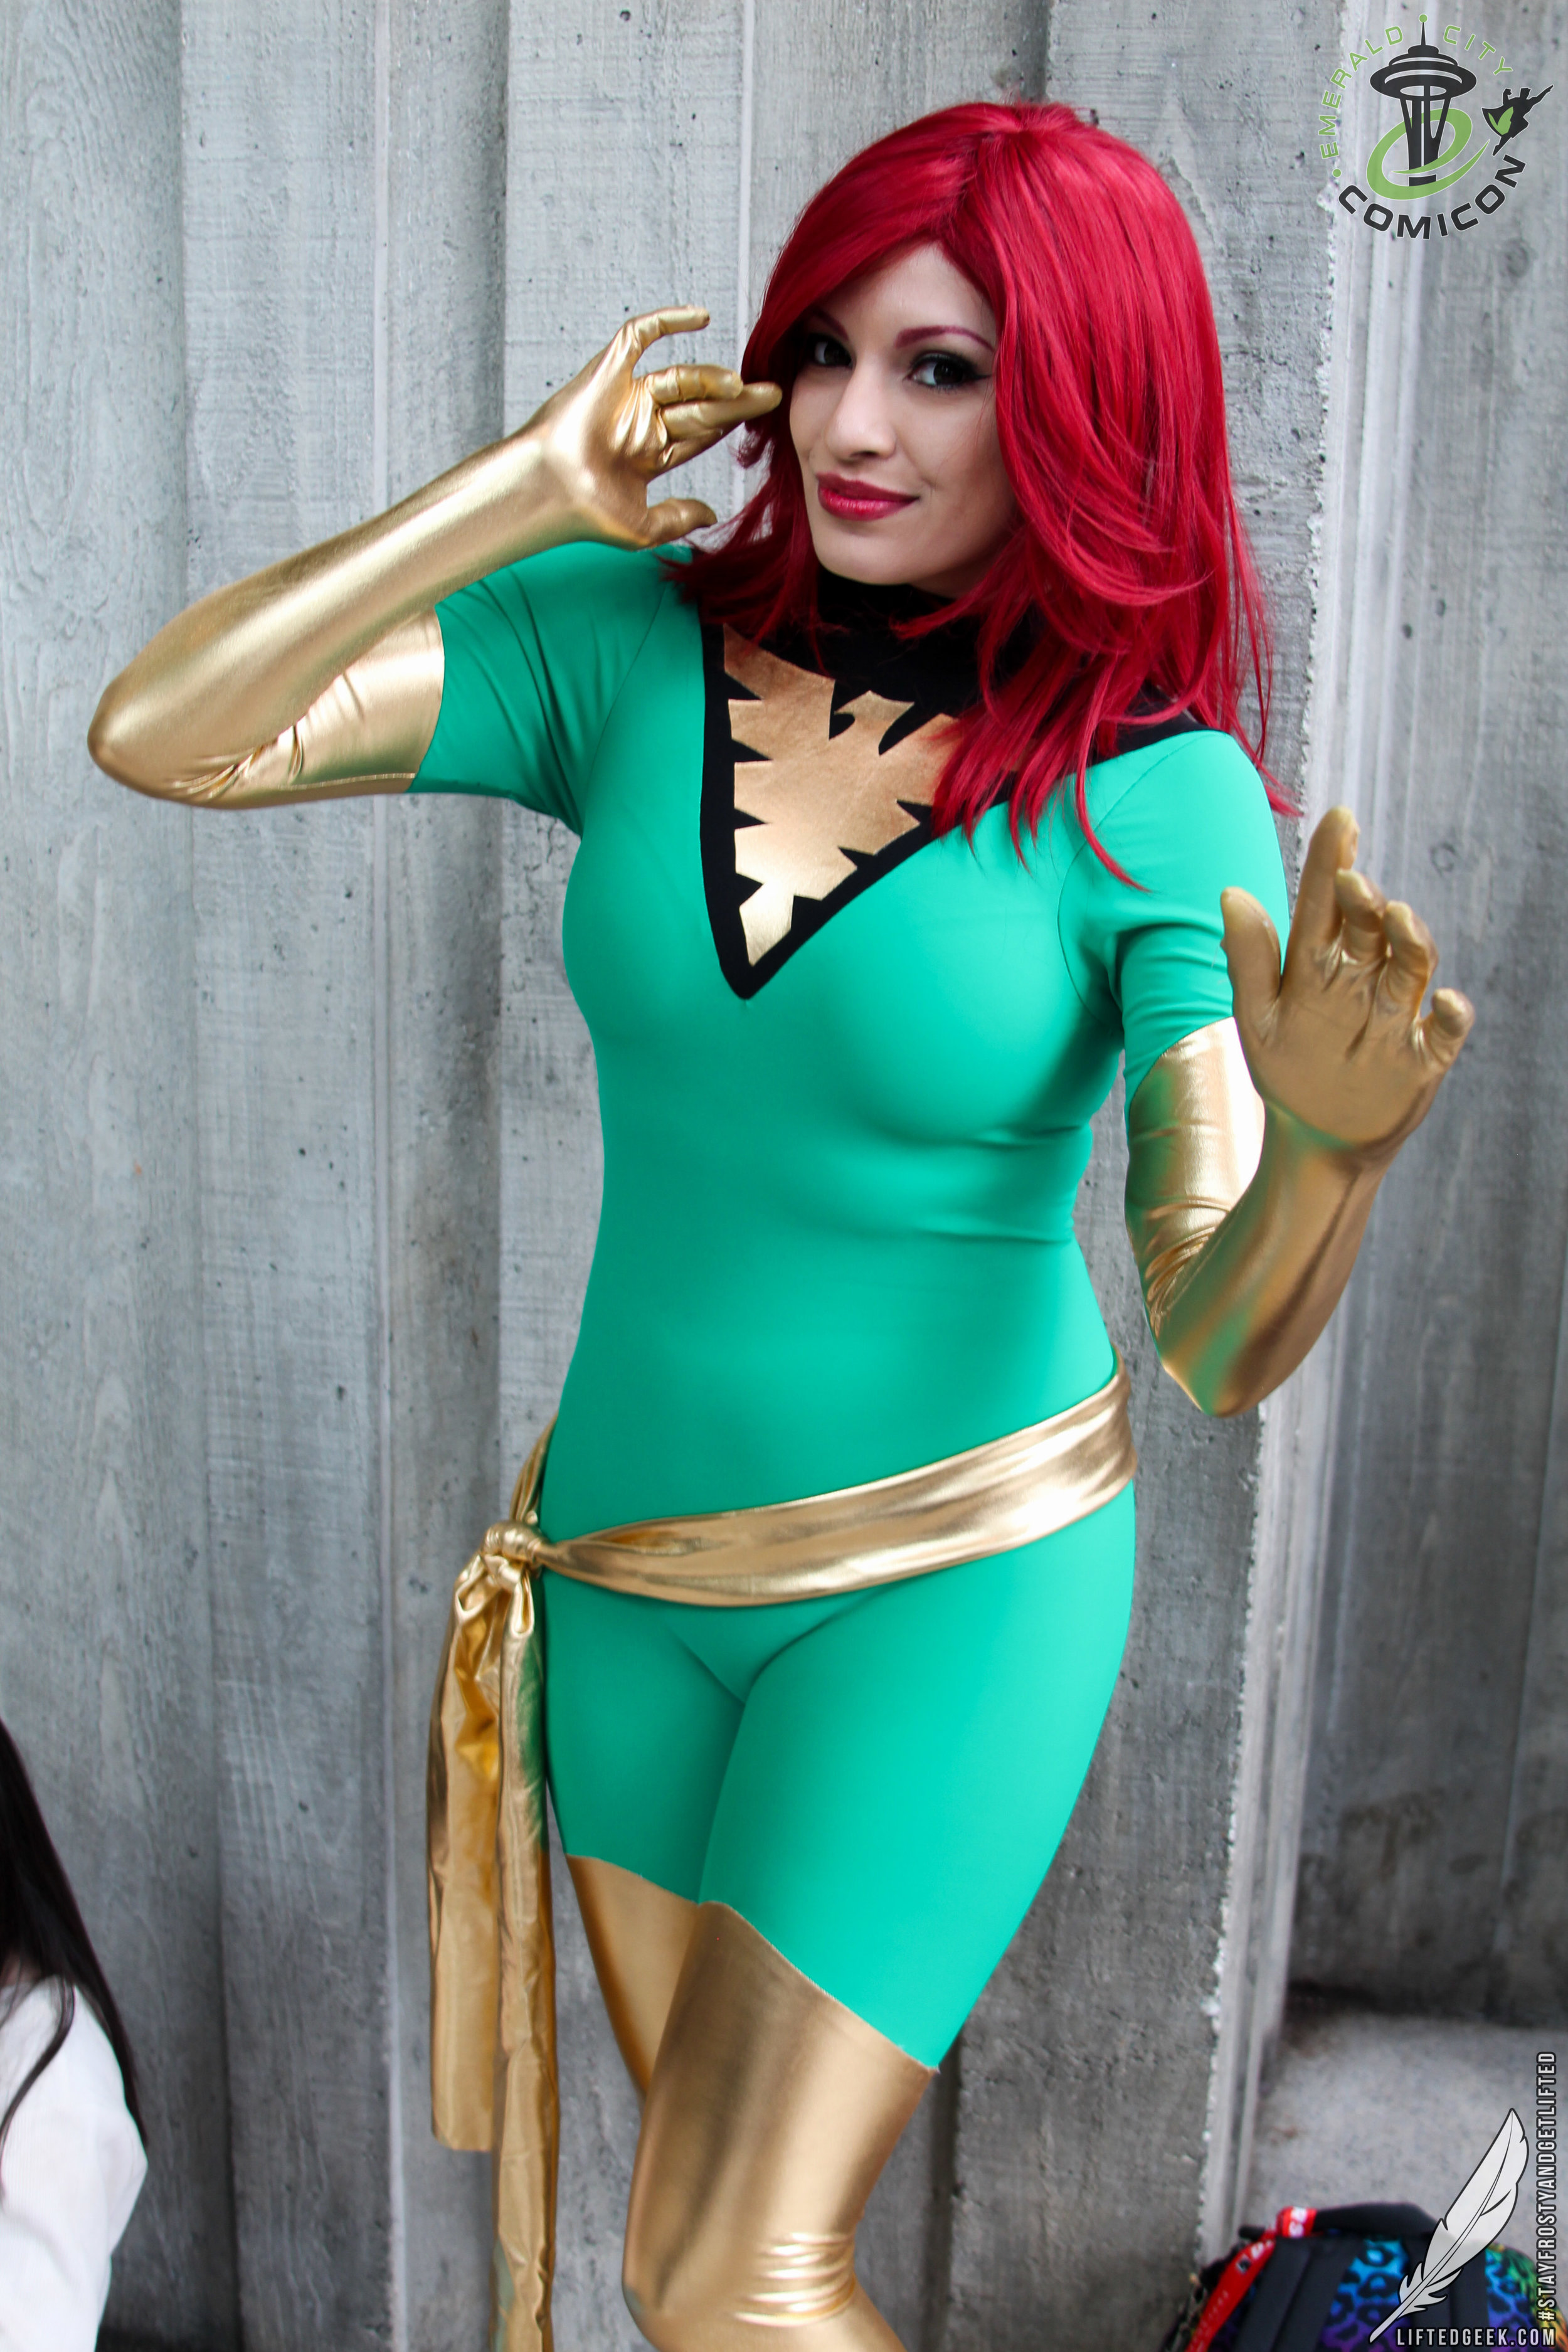 ECCC2018-cosplay-61.jpg